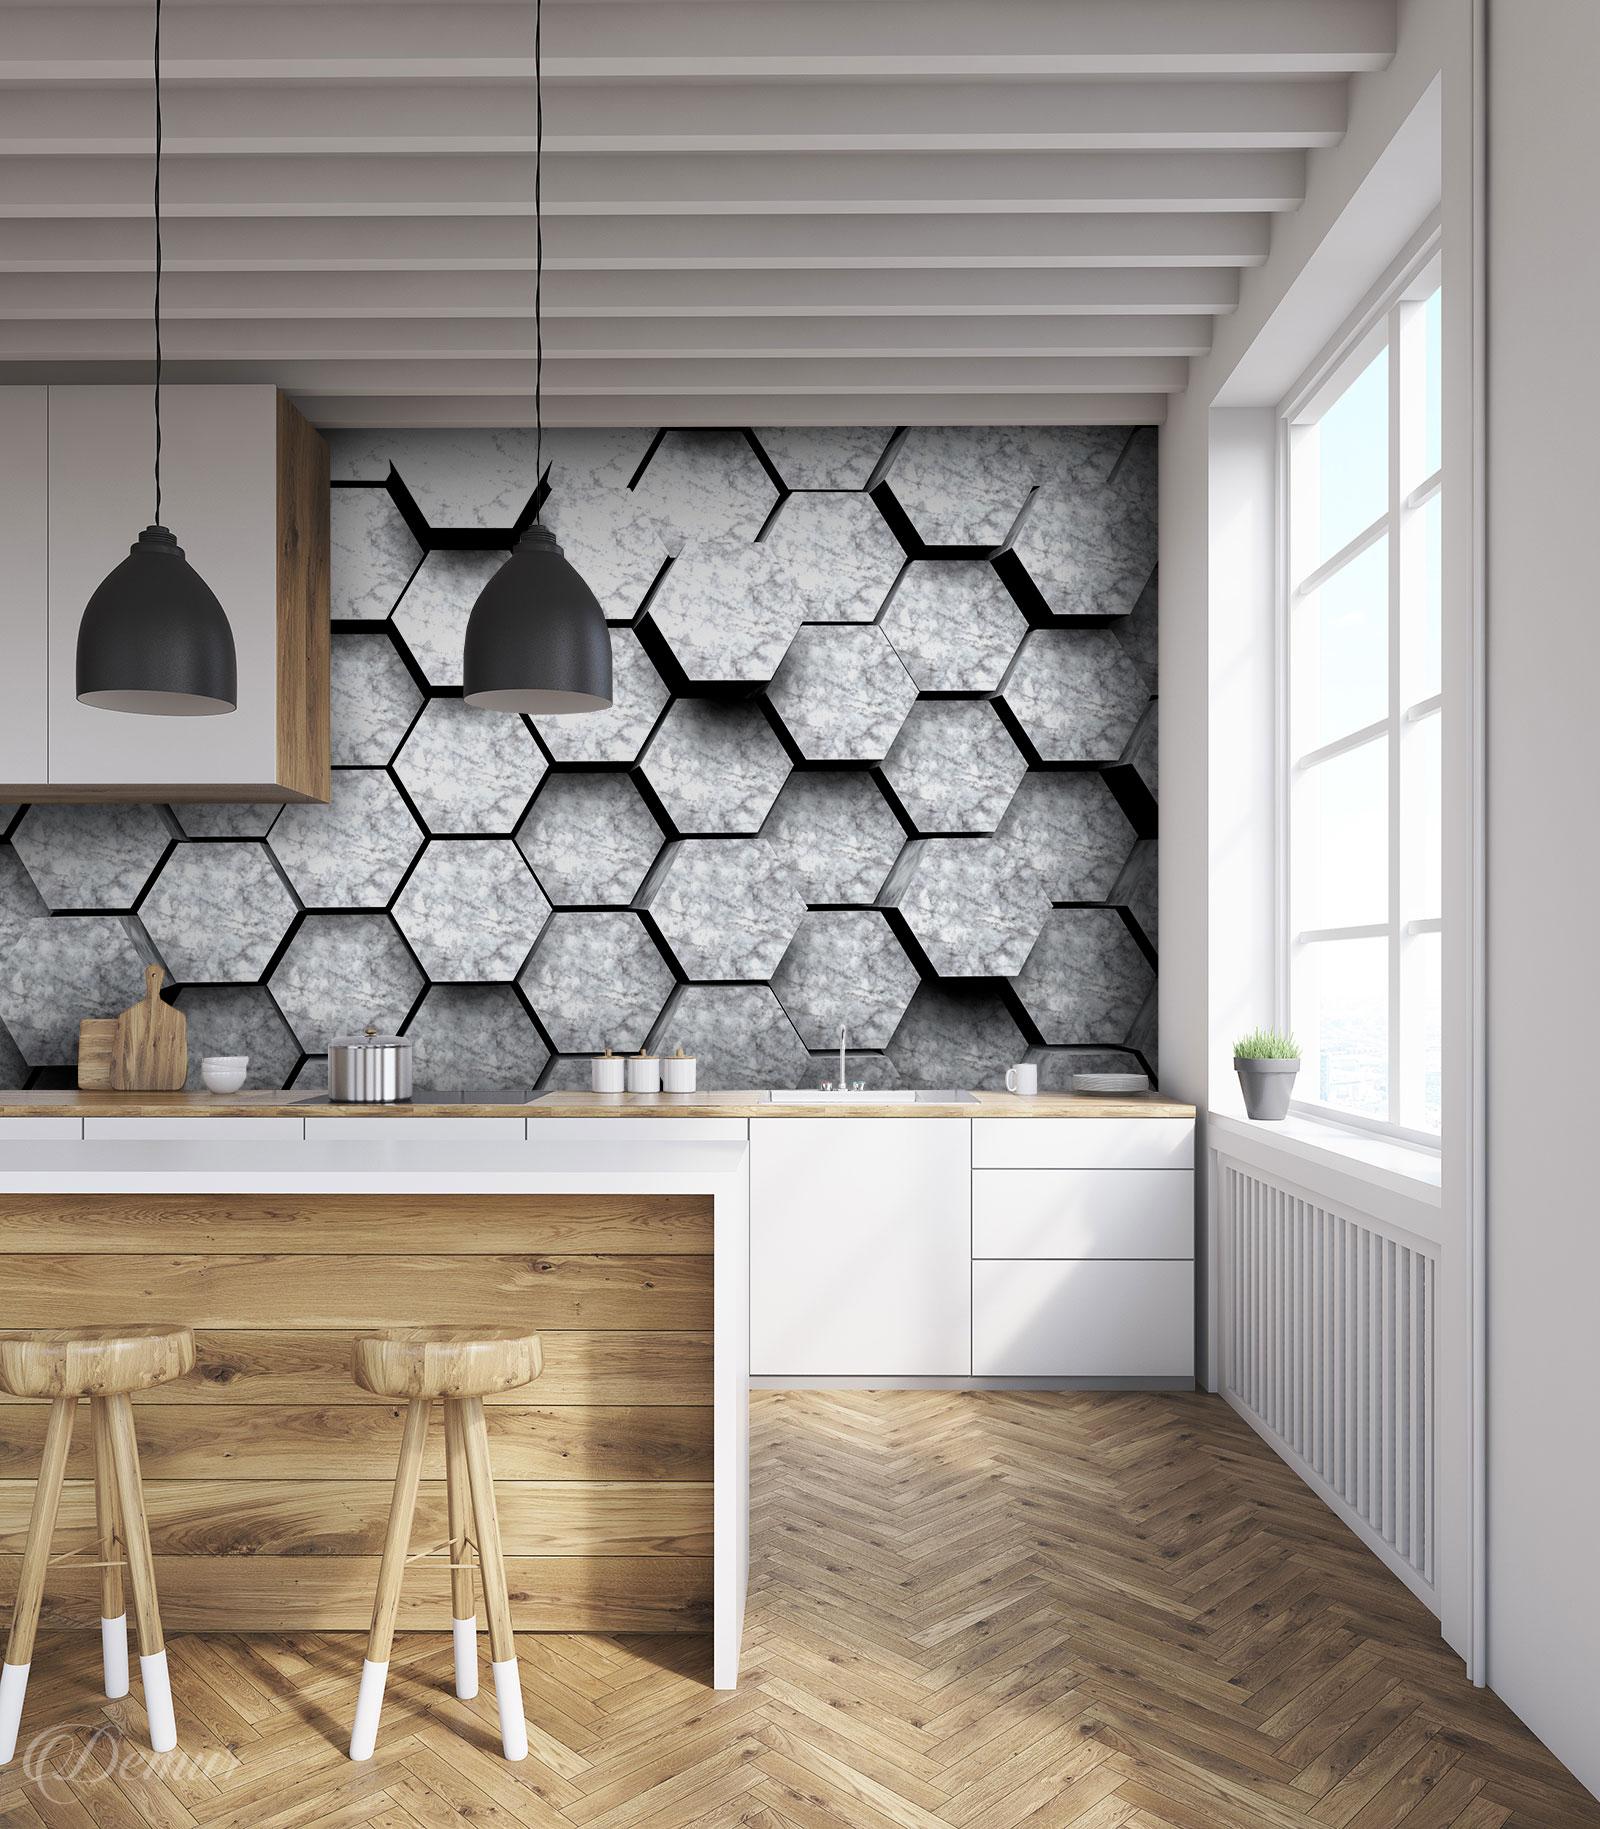 Fototapeta 3D marmurowe bryły - Fototapety do kuchni laminowane - Demur